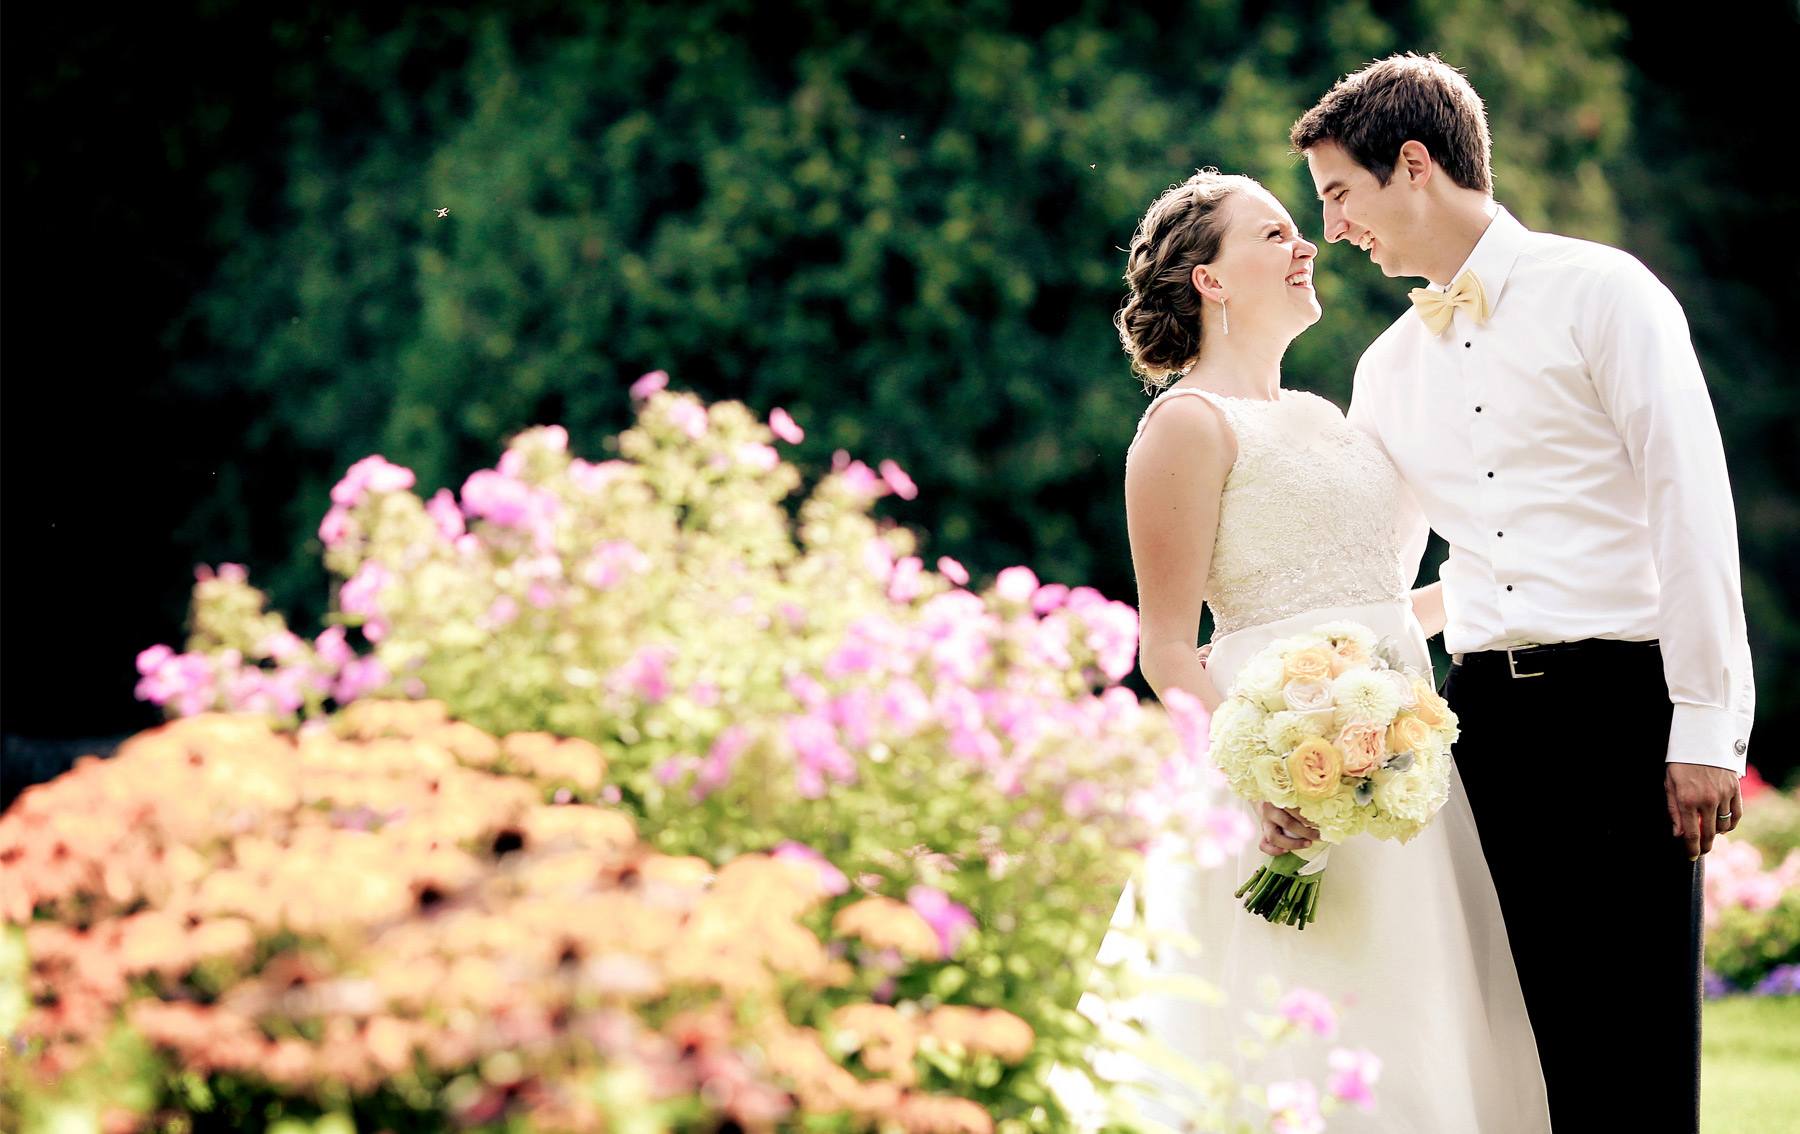 12-Minneapolis-Minnesota-Wedding-Photography-by-Vick-Photography-Edina-Grace-&-Nick.jpg